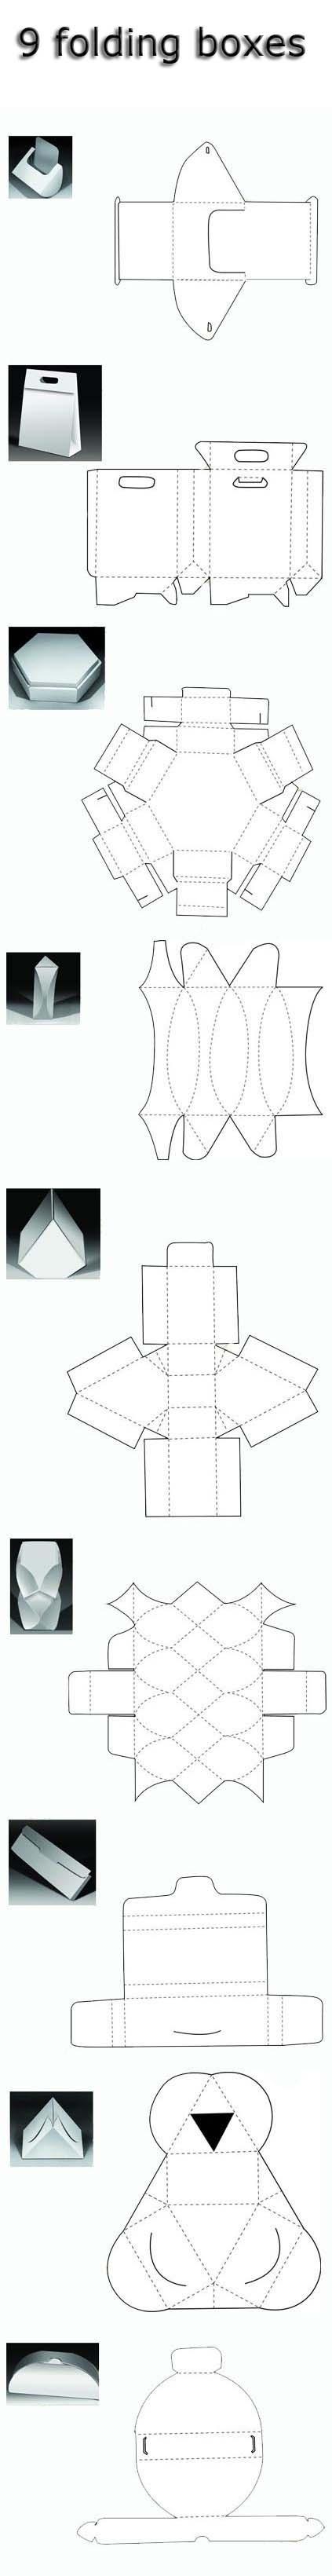 9 folding boxes